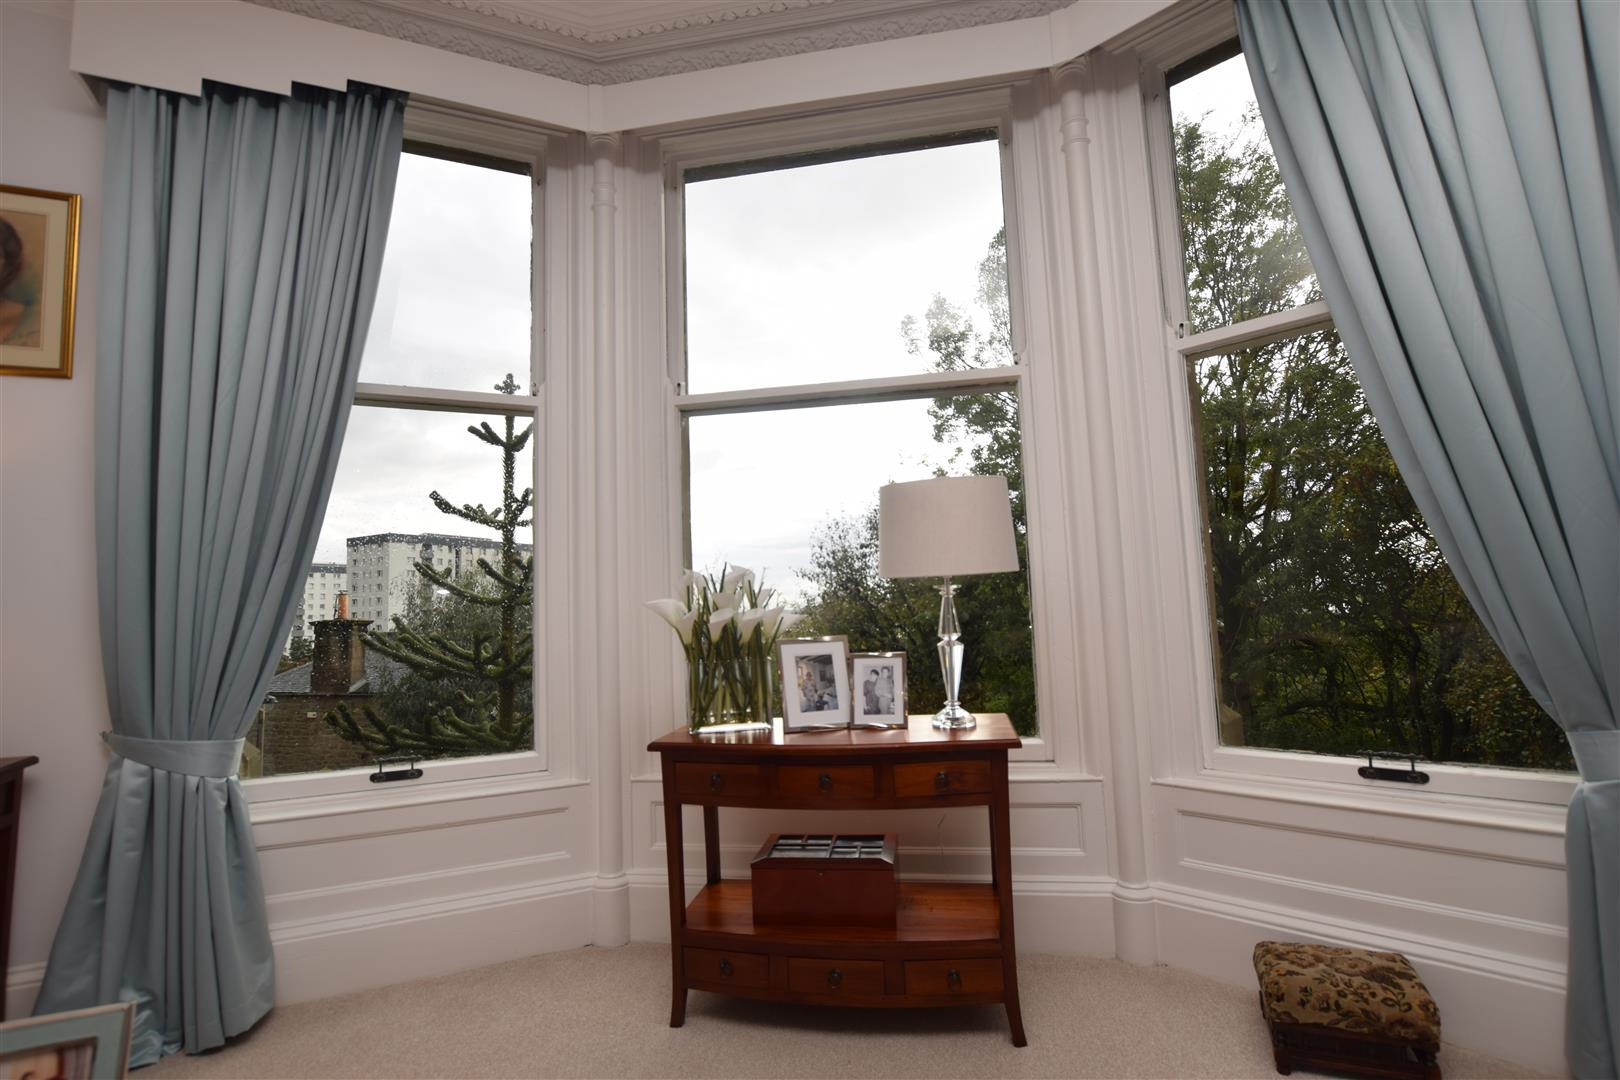 Upper Flat, 8, Union Terrace, Dundee, Angus, DD3 6JD, UK